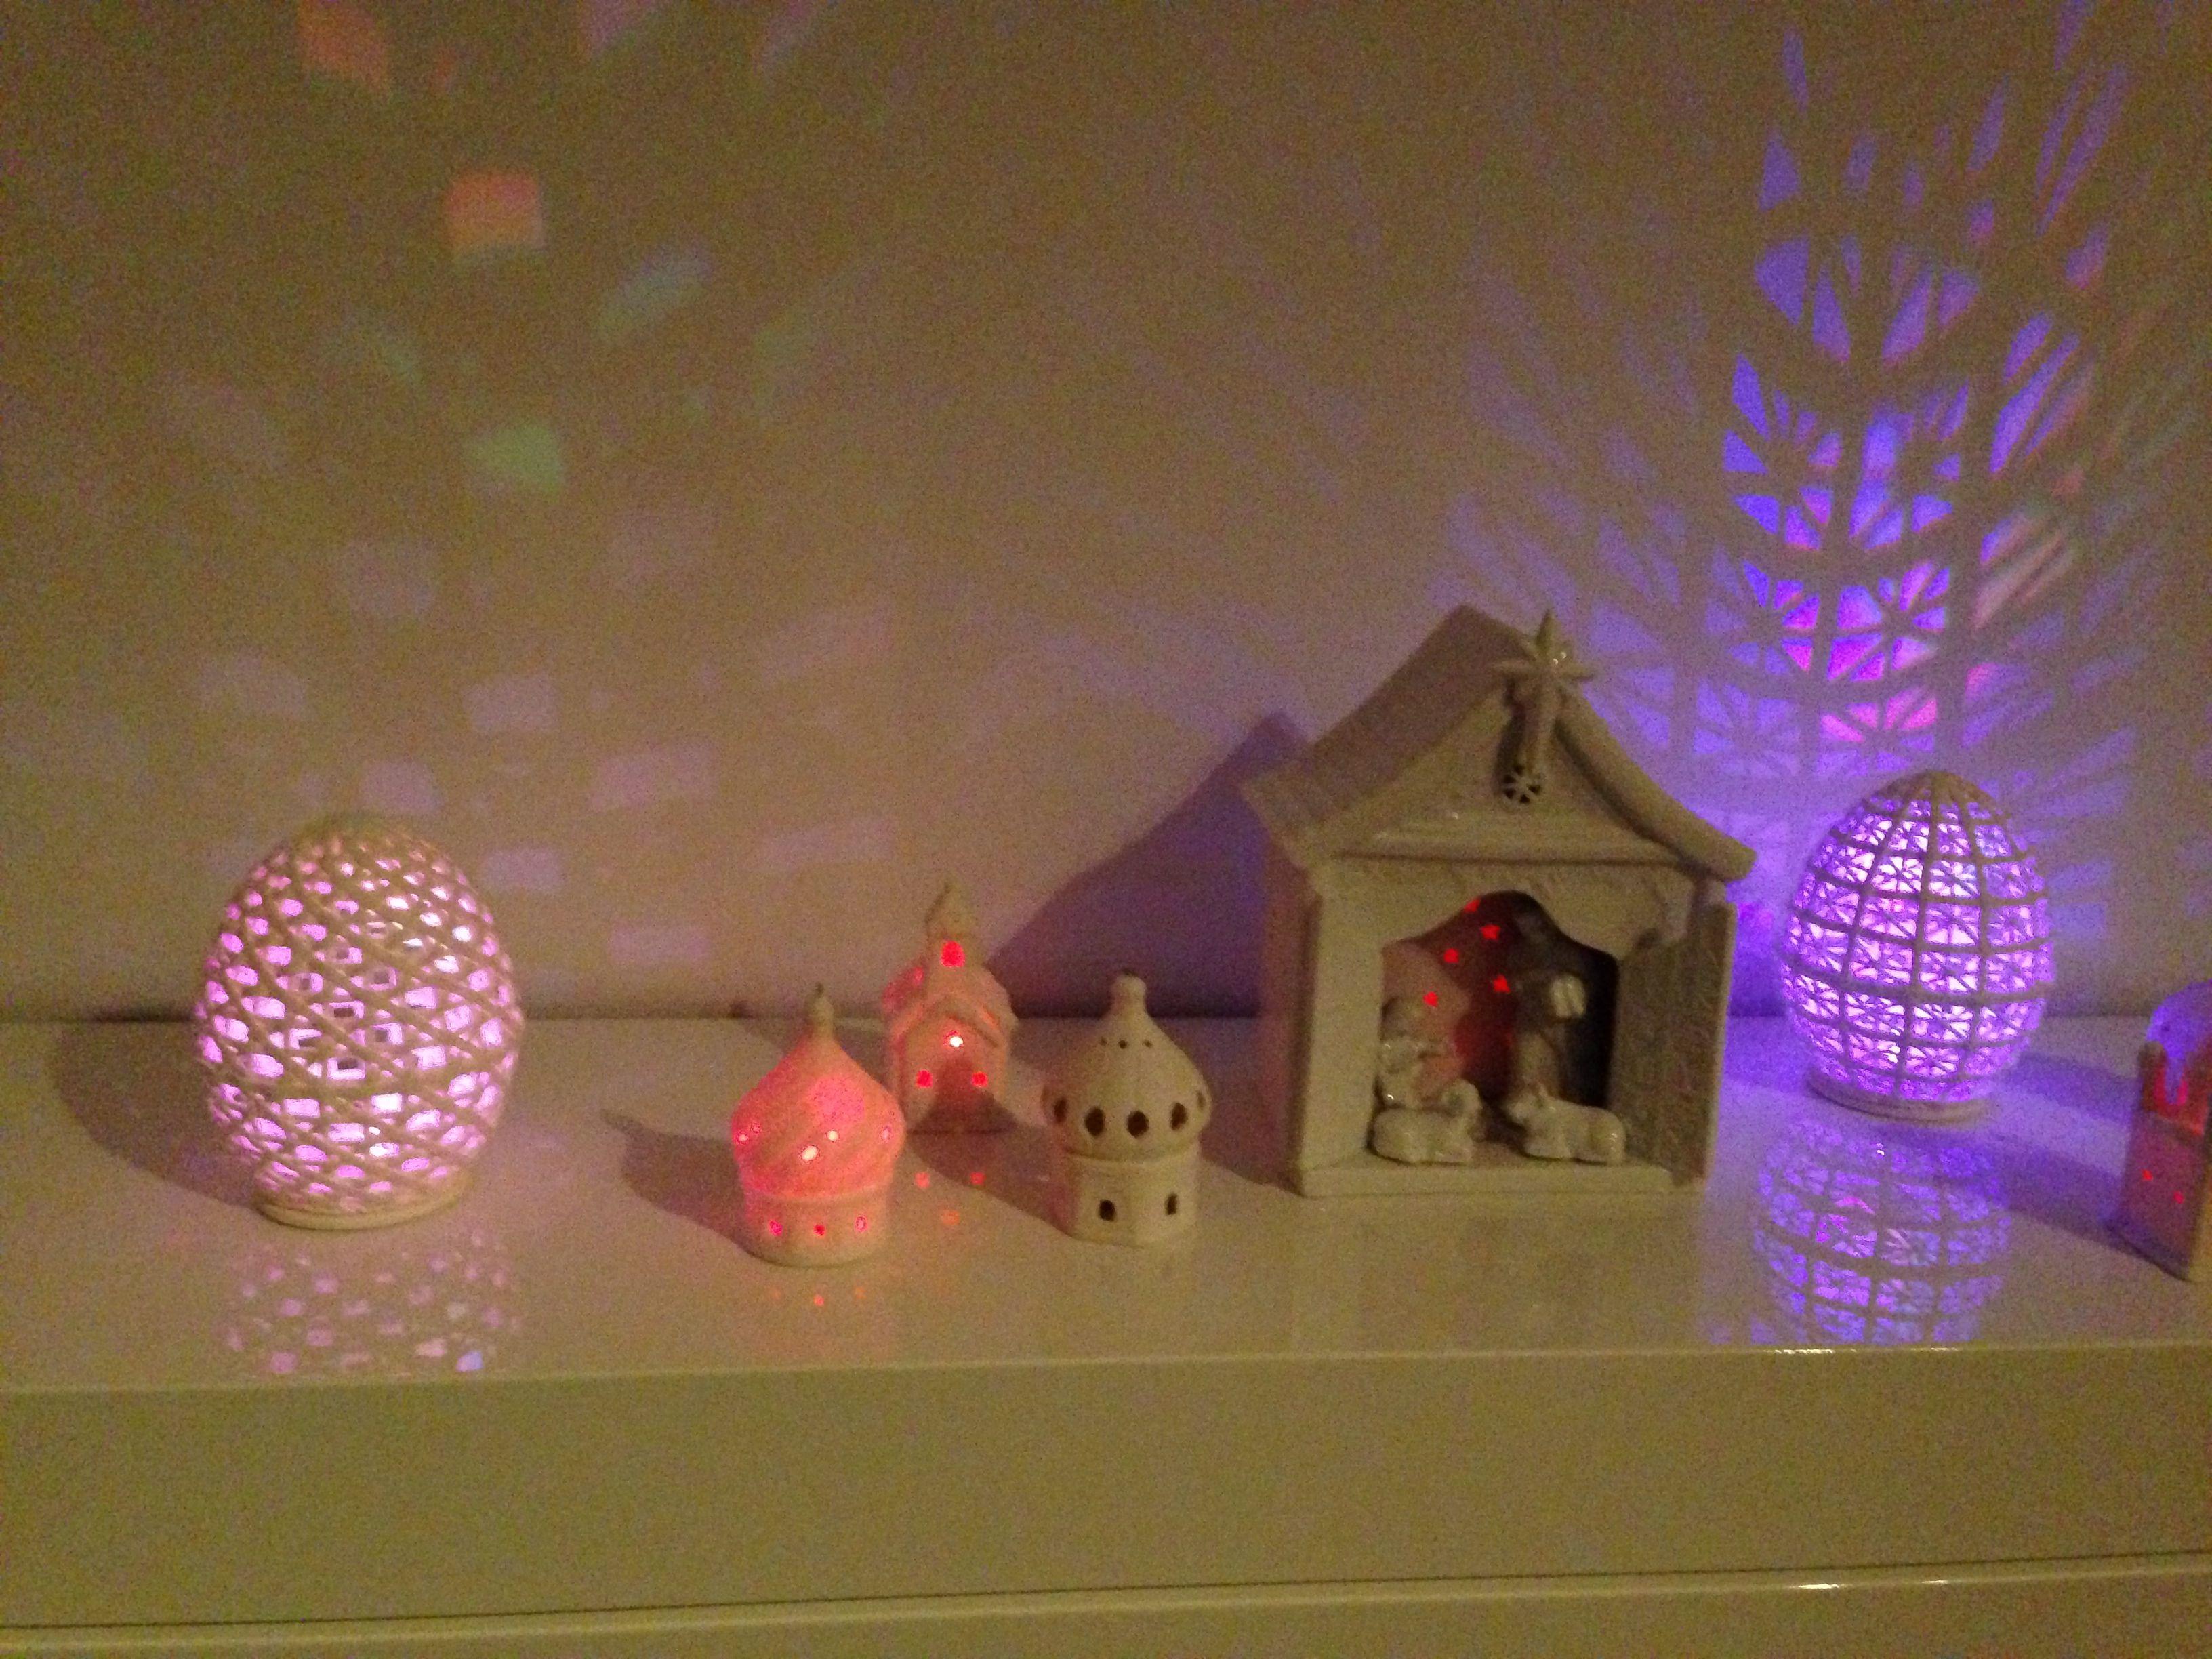 16x Neutrale Kerstdecoraties : Pin van juliette orie op kerst at home db pinterest